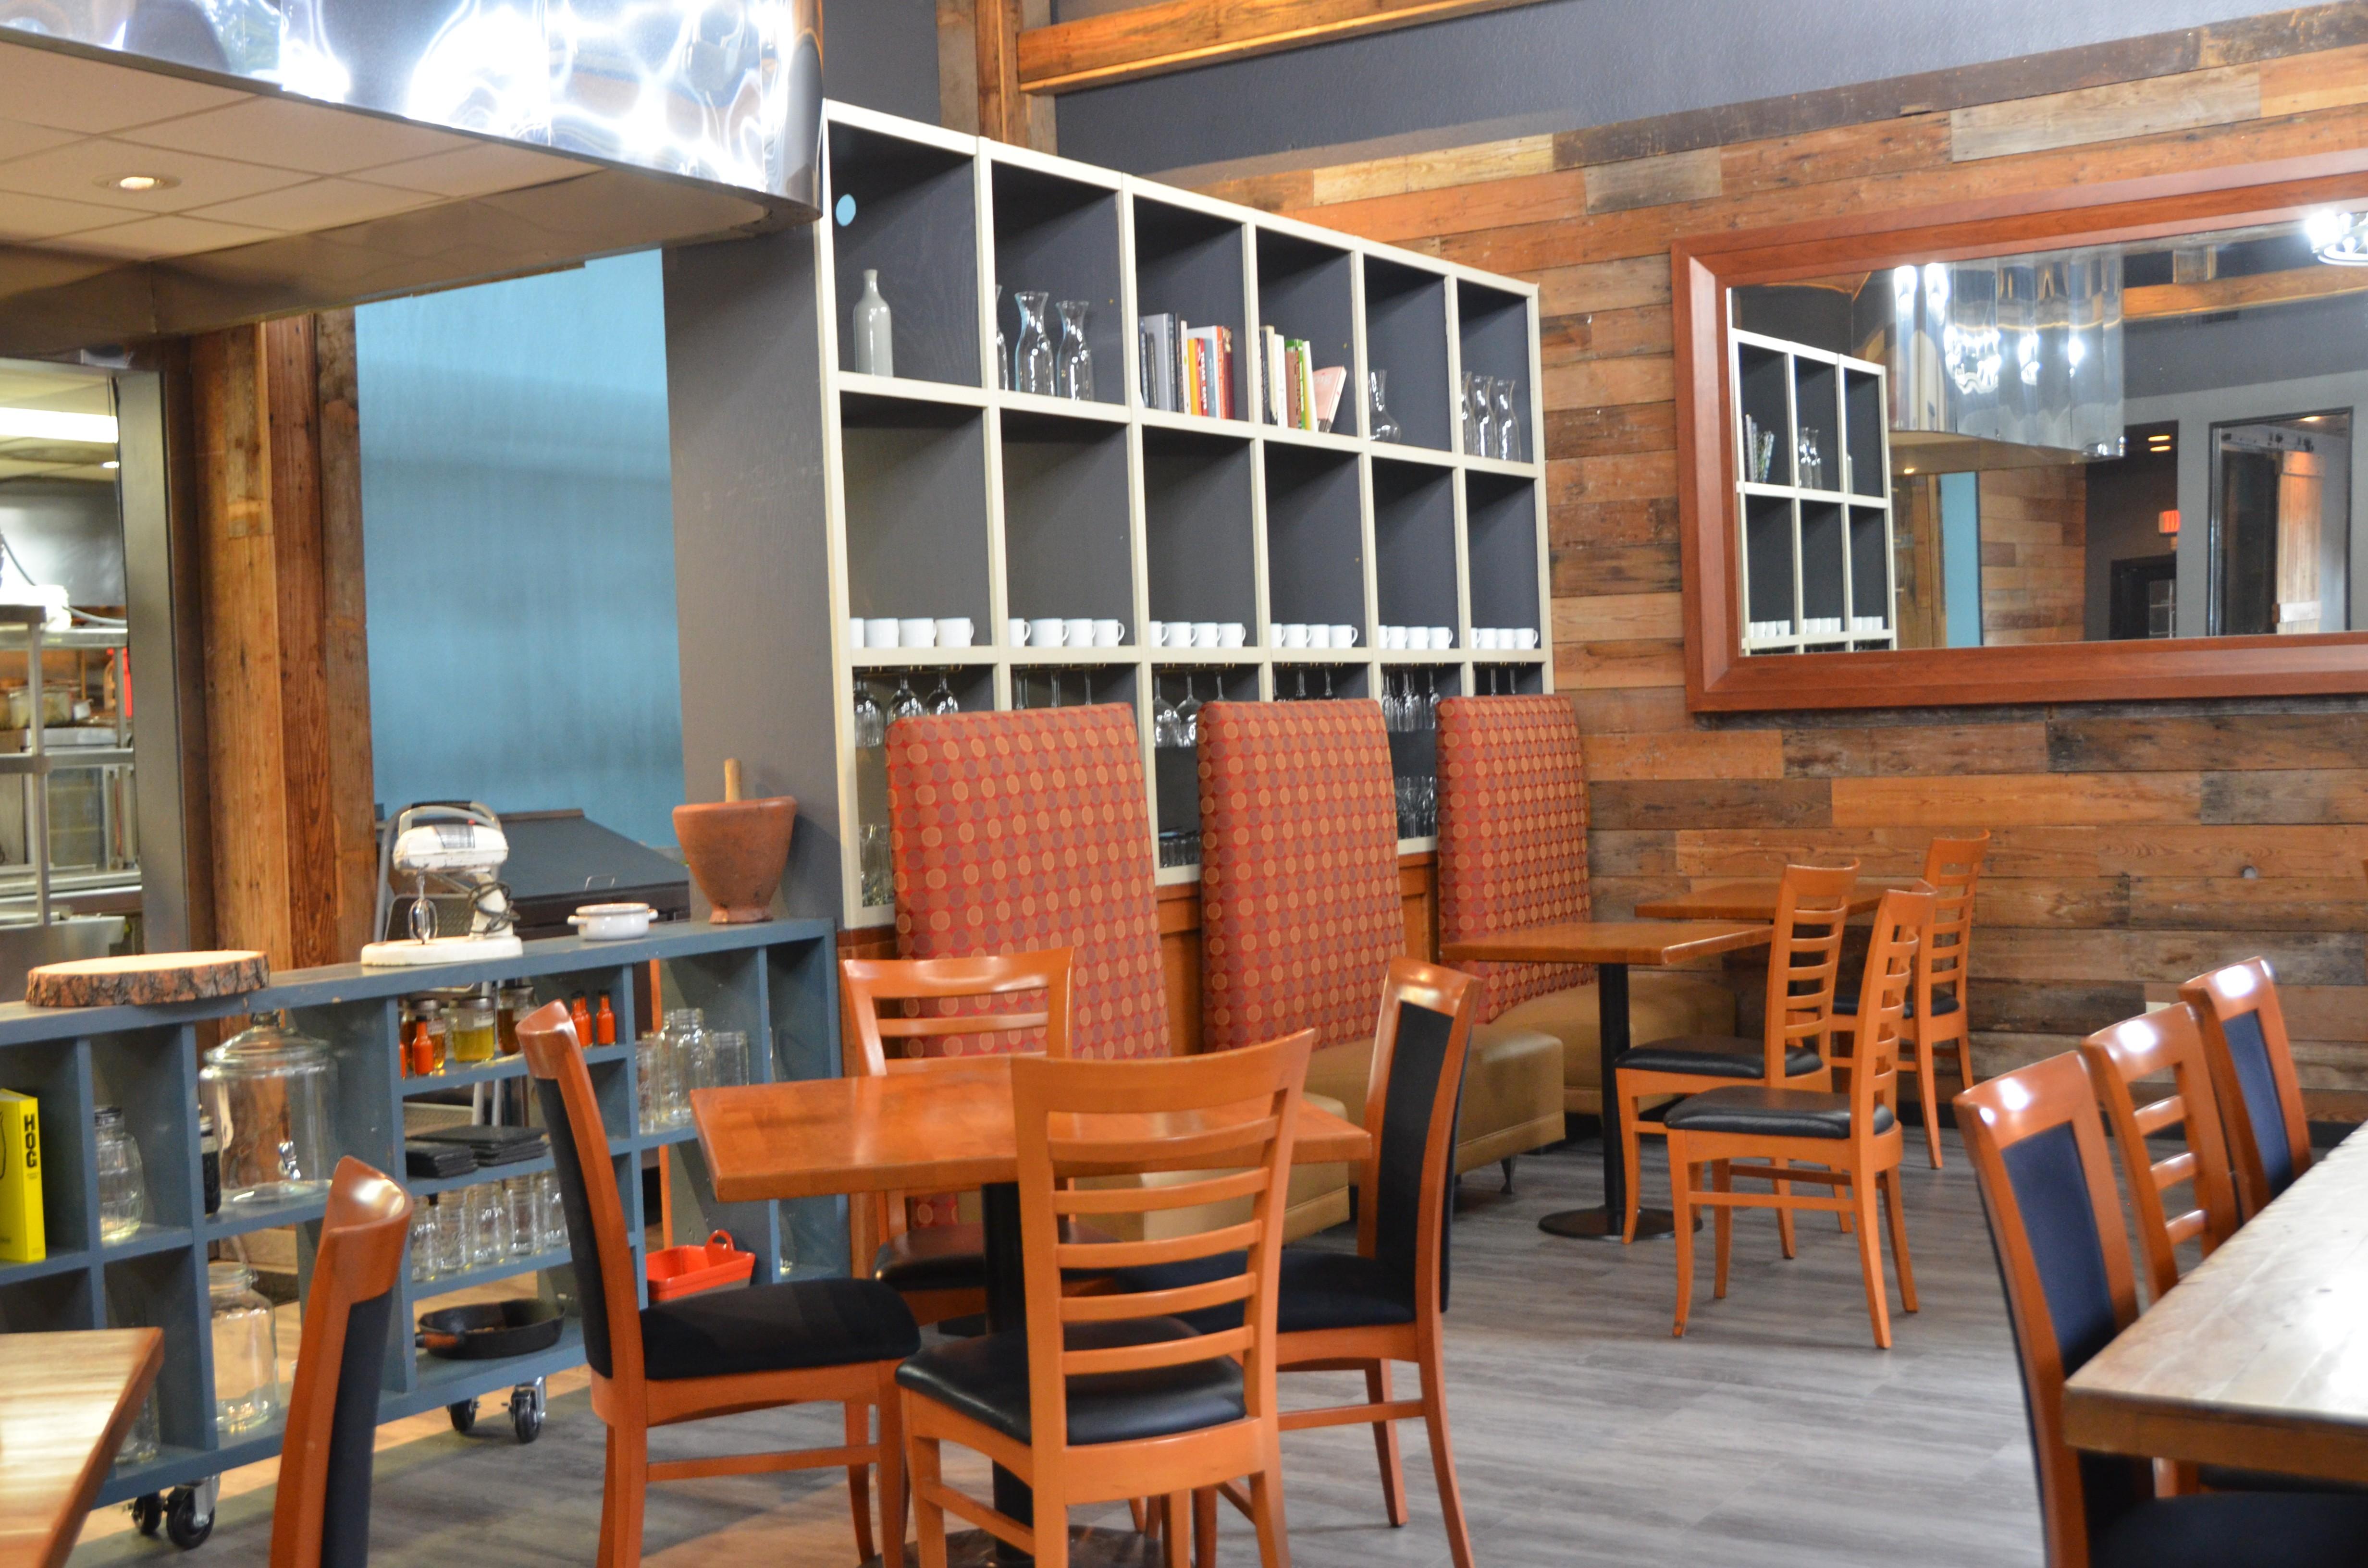 San Antonio Chefs, Brands to Host Backyard BBQ This Month